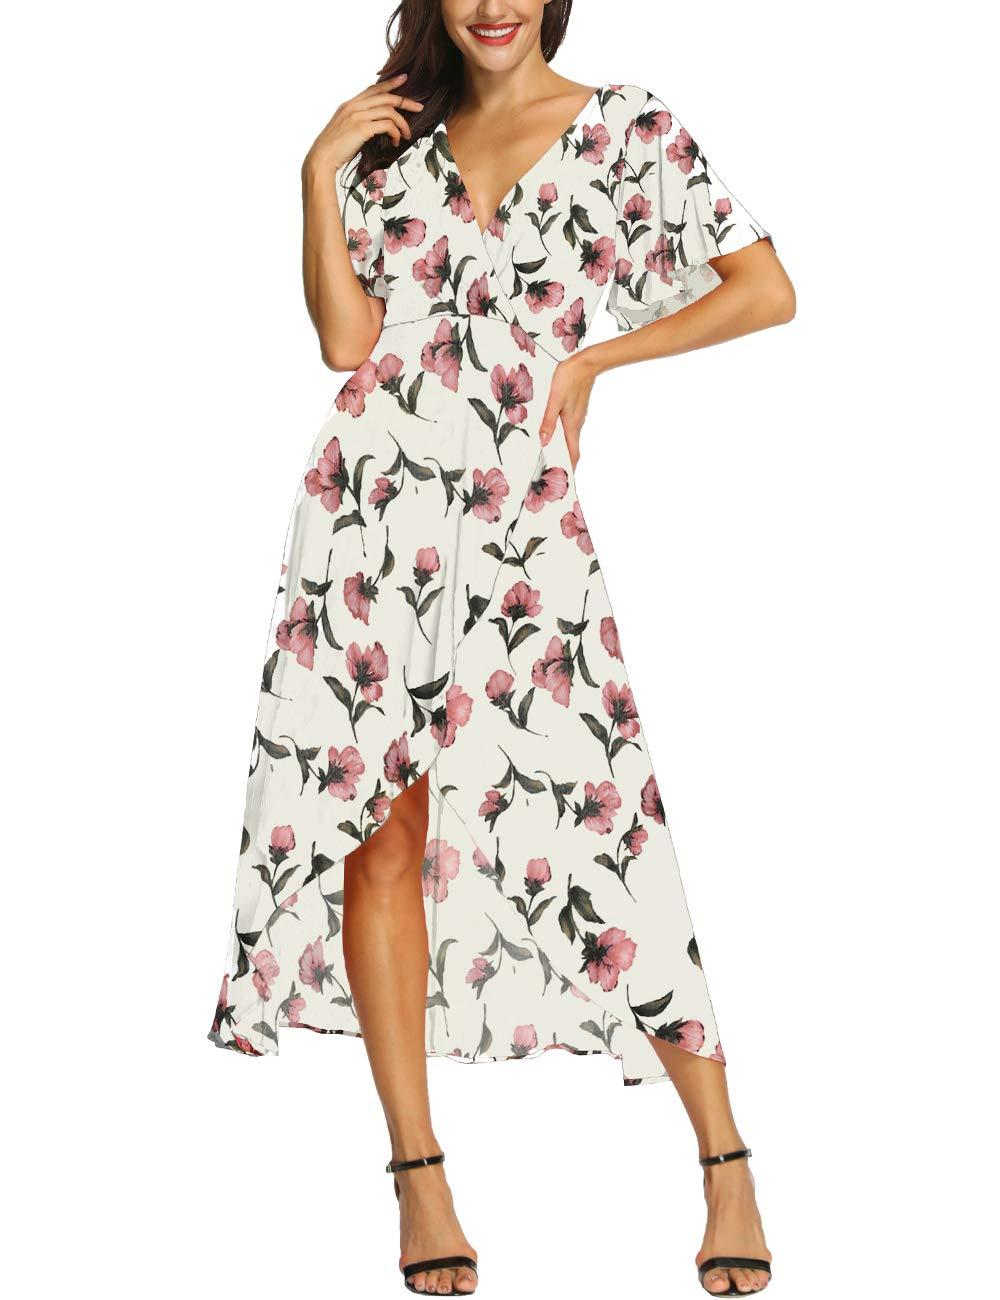 Azalosie Wrap Maxi Dress Short Sleeve V Buy Online In Bahamas At Desertcart